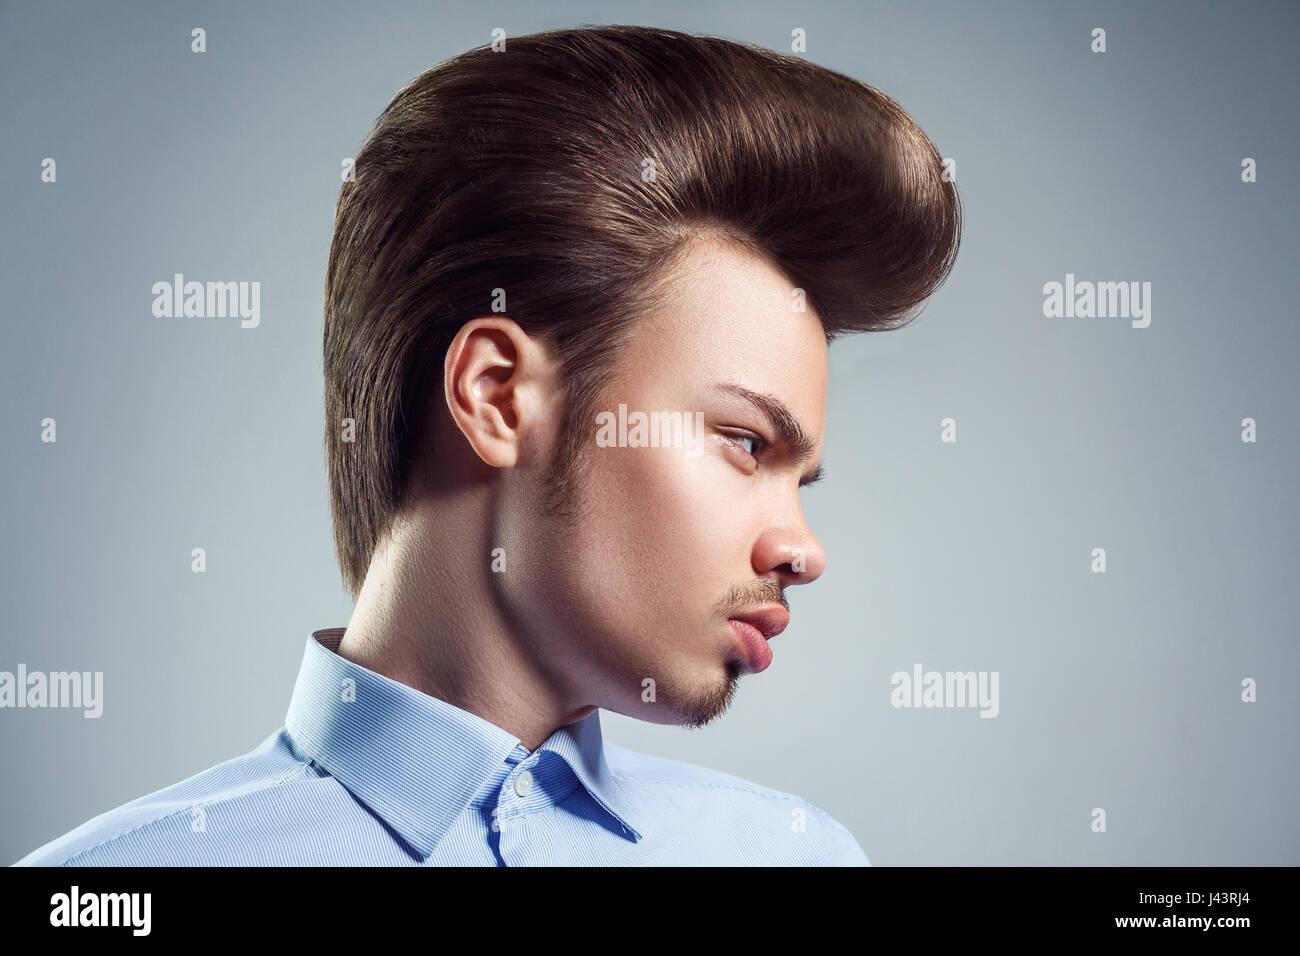 Elvis Presley Frisur Stockfotos Elvis Presley Frisur Bilder Alamy